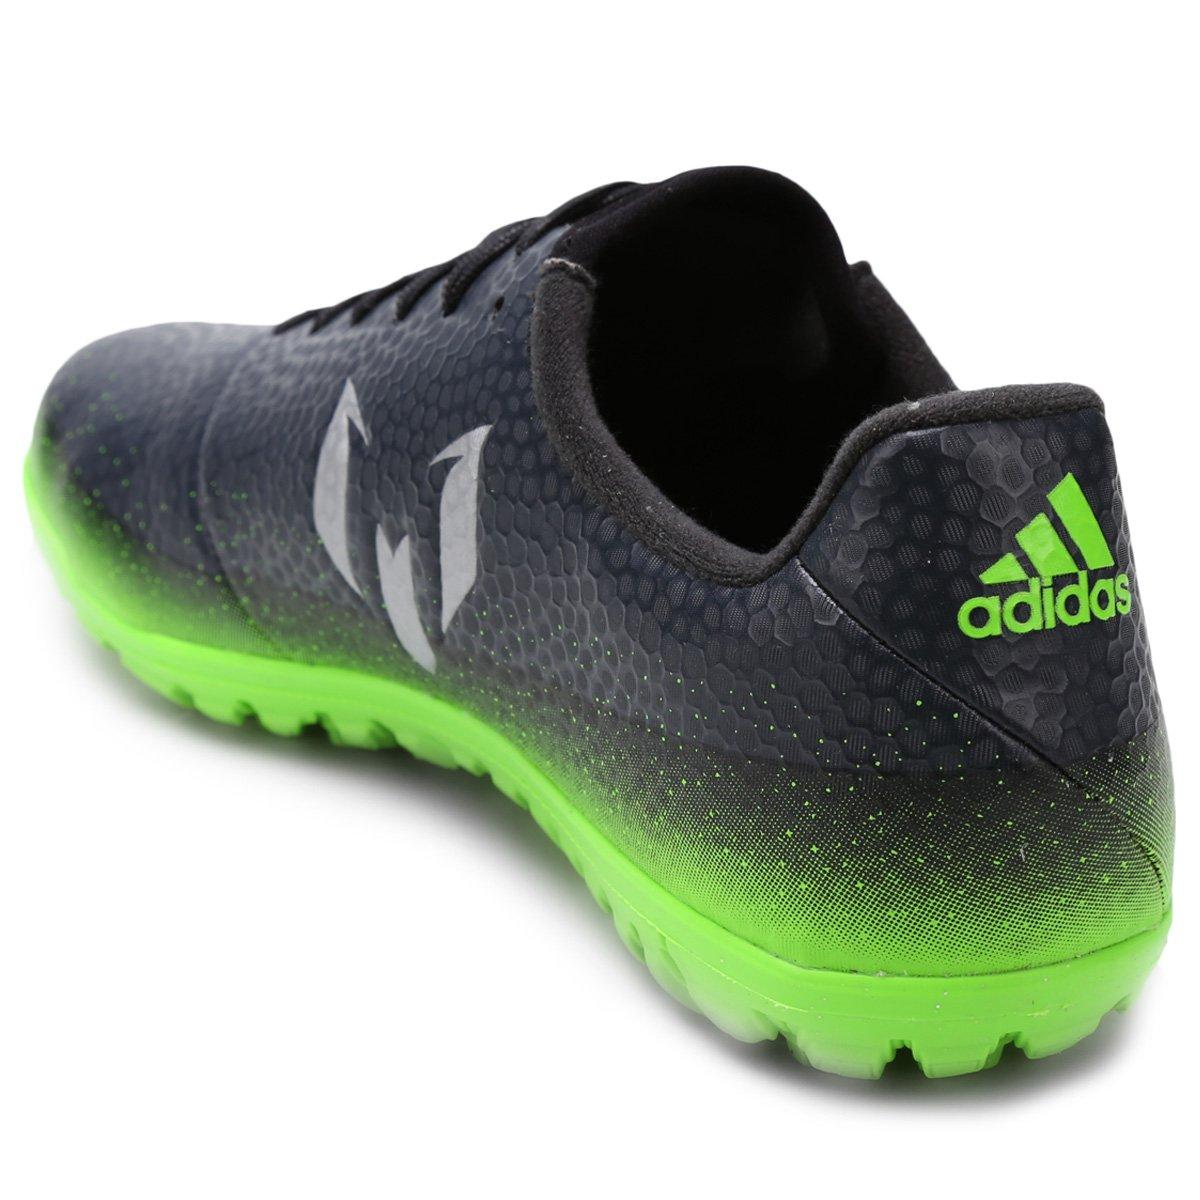 0ebab95c95 Chuteira Society Adidas Messi 16.3 TF Masculina - Chumbo e Verde ...